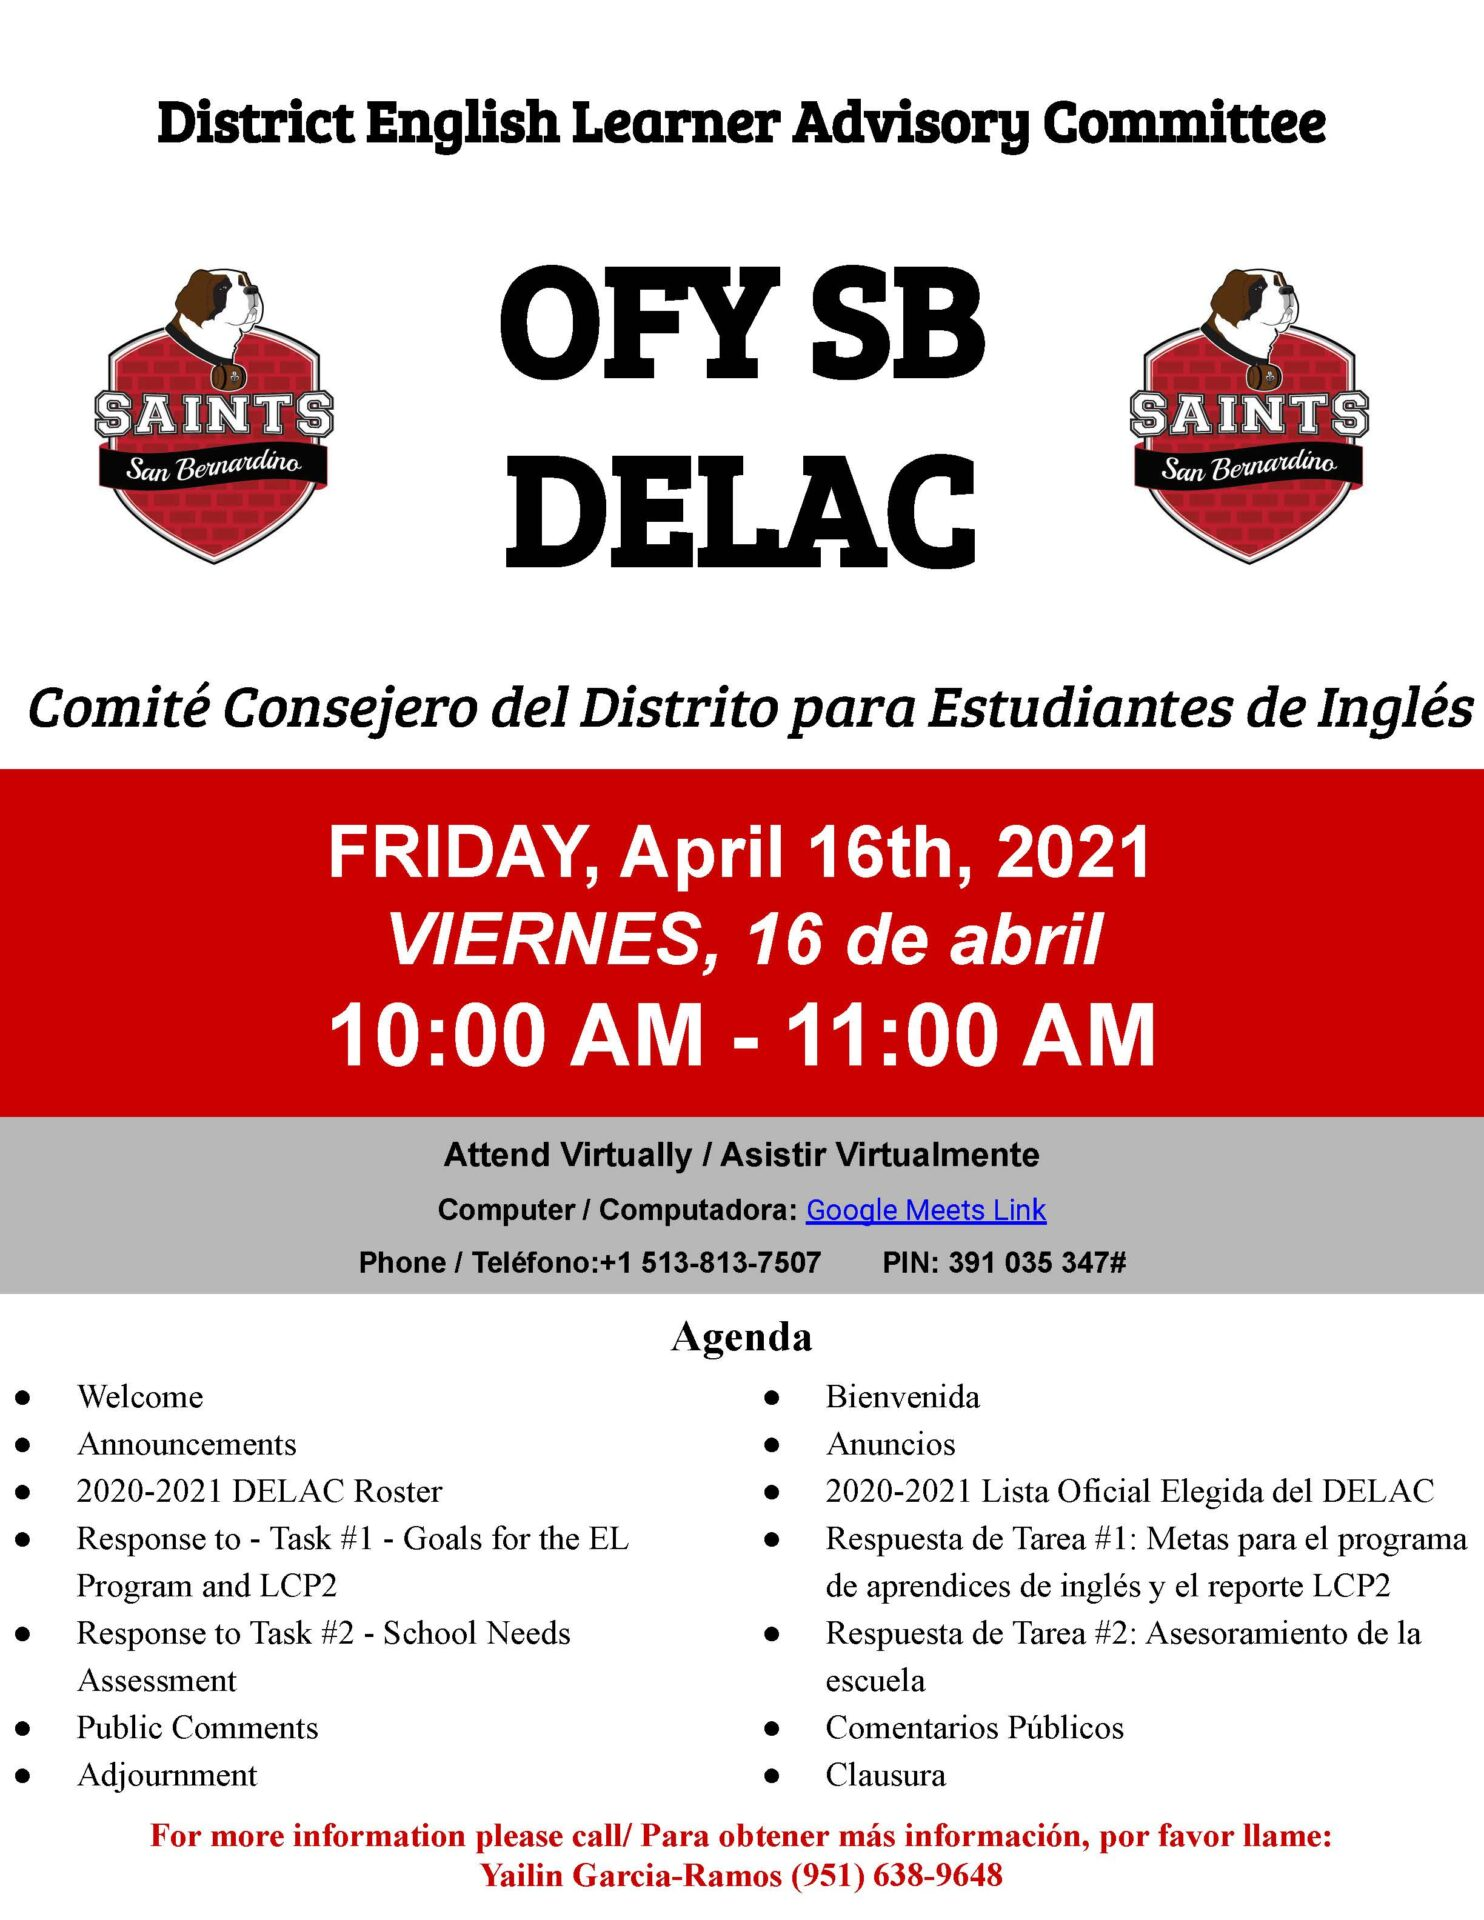 DELAC Meeting